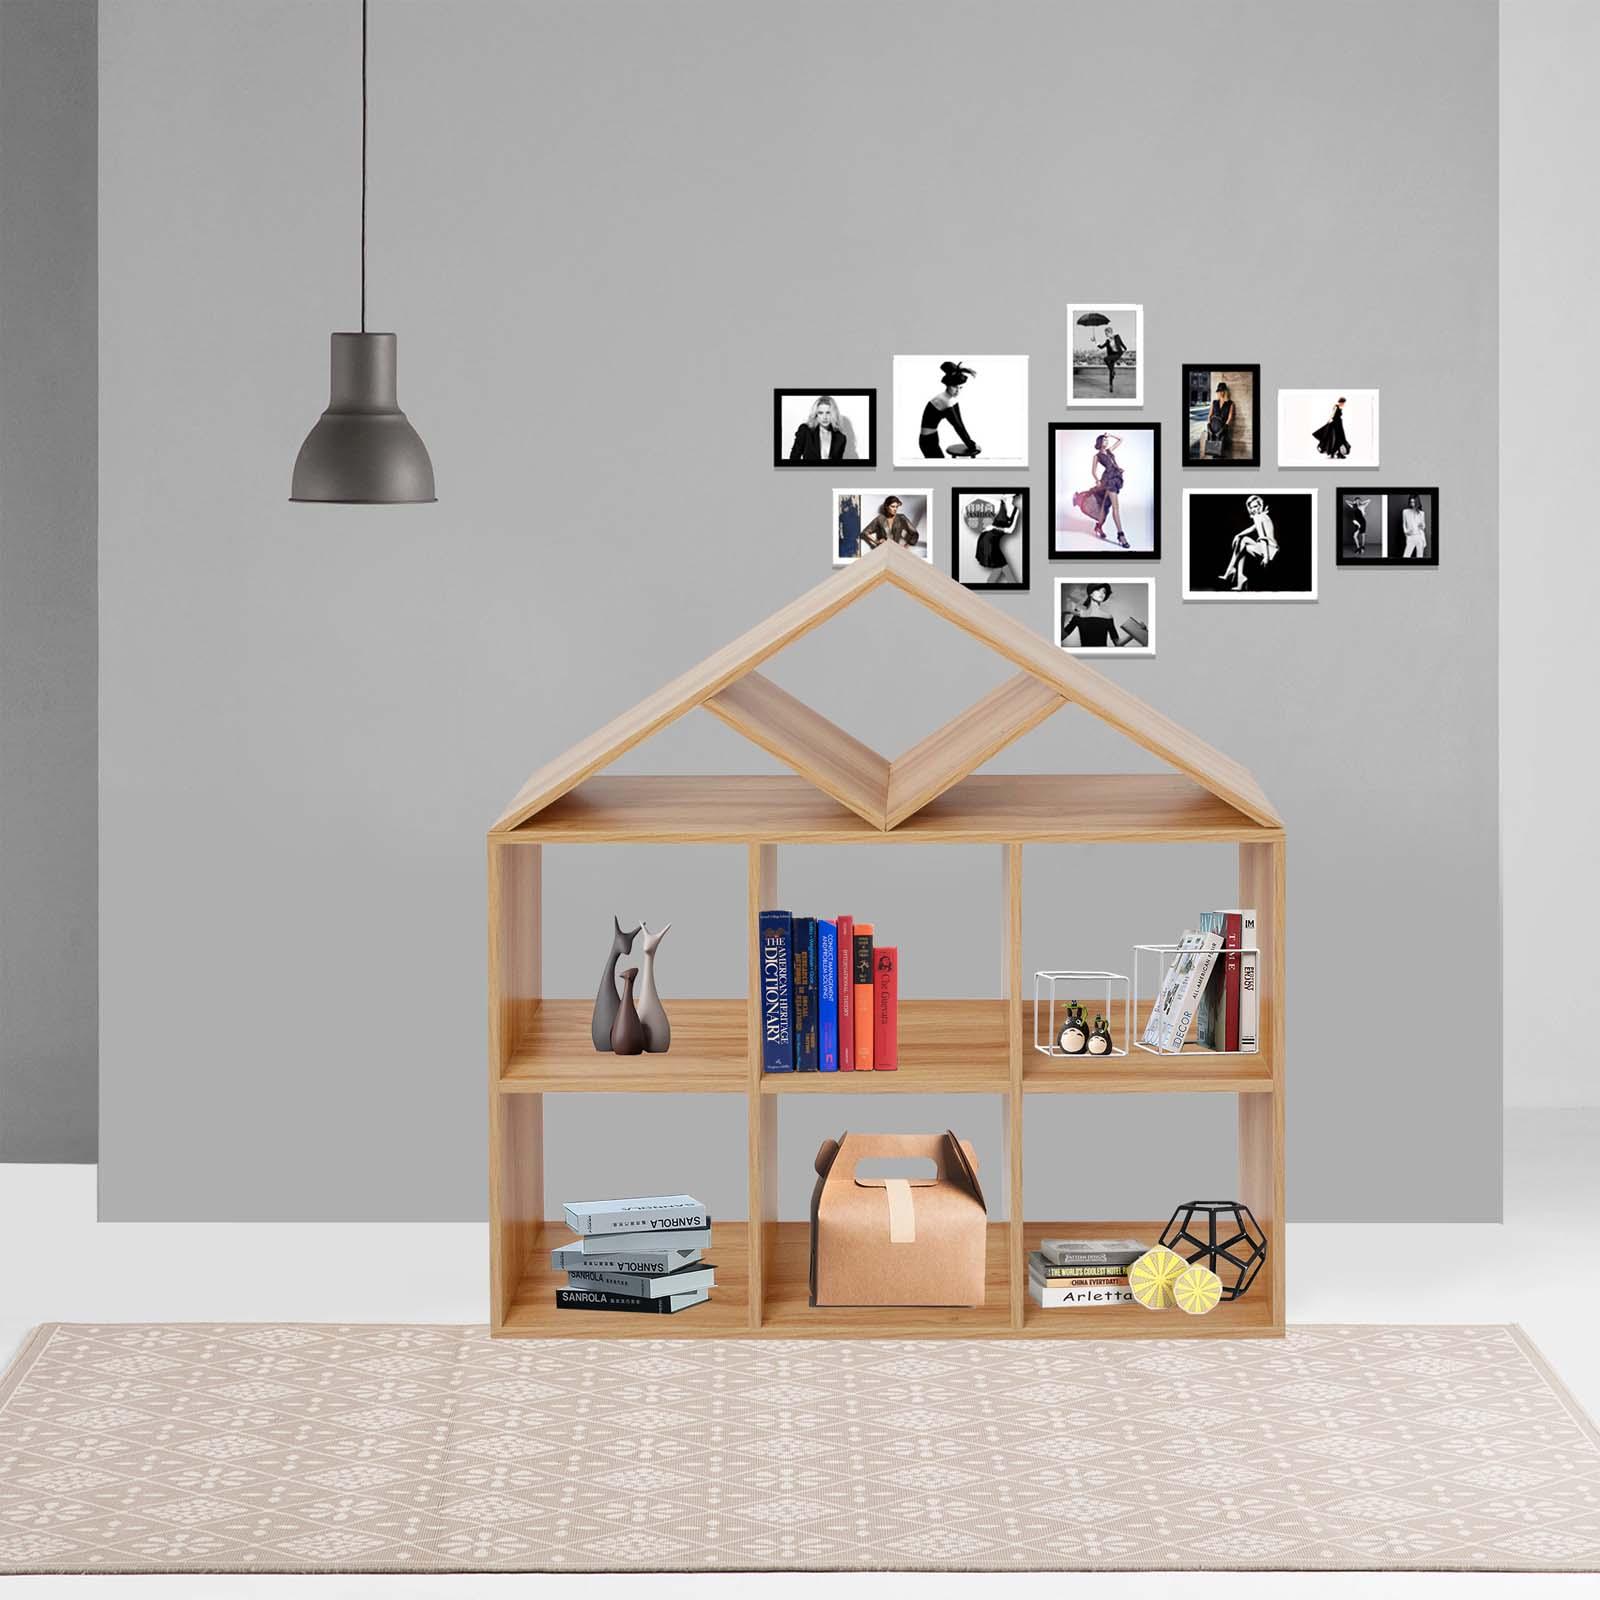 Details About Shelf Shelving Display Unit Bookcase Room Divider House Shaped 9 Lattices Oak